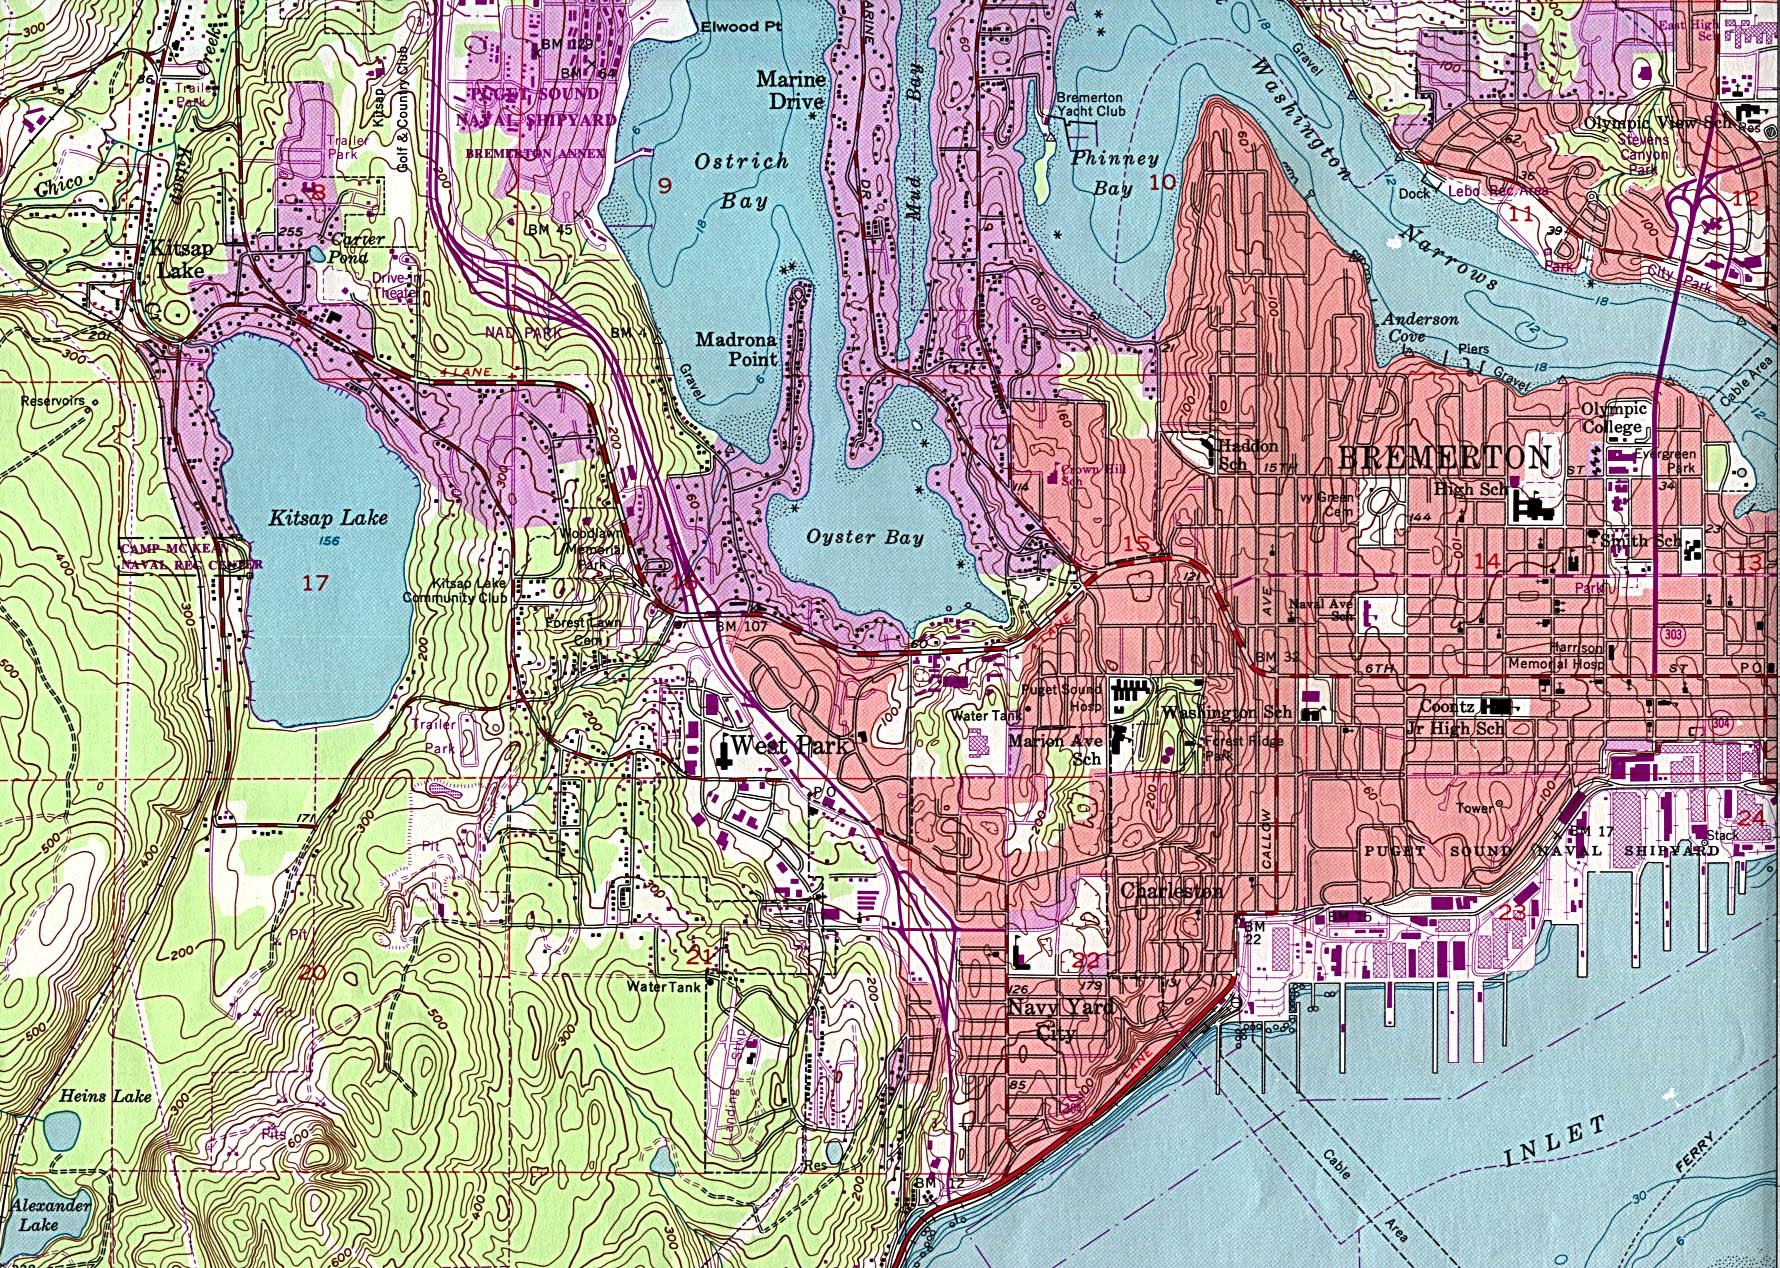 Bremerton  Topographic City Map, Washington, United States